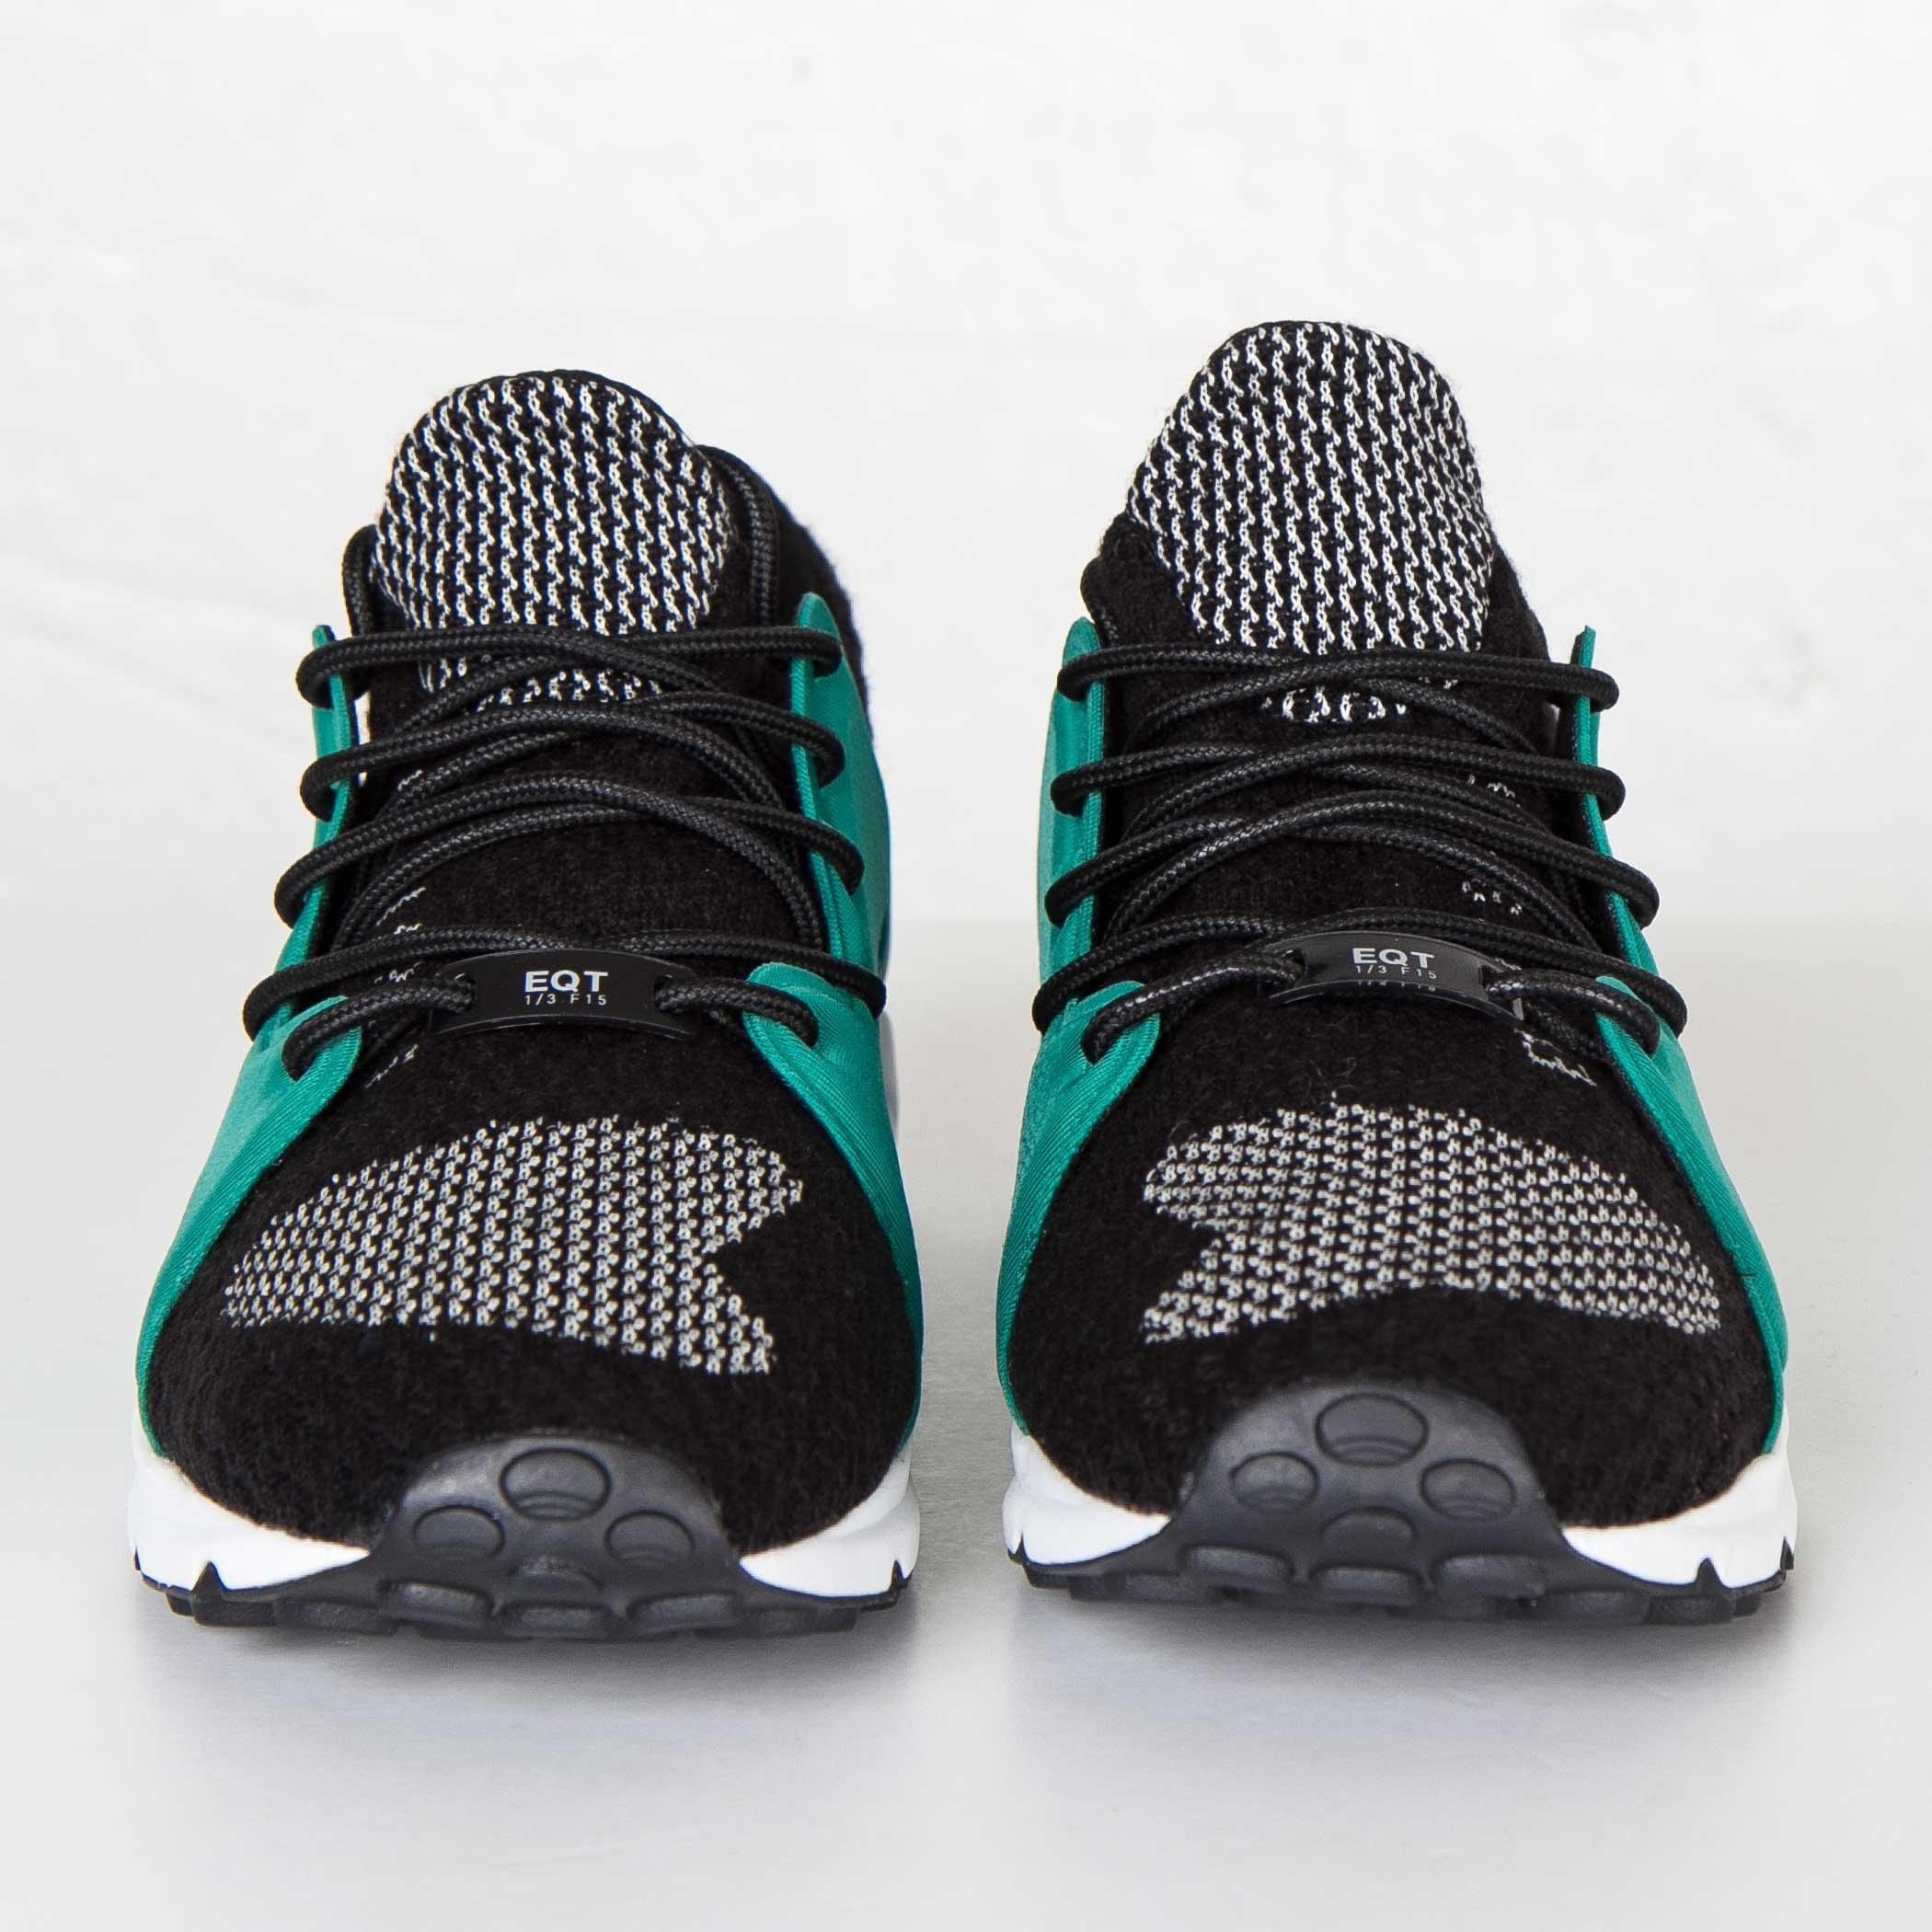 newest d68c8 b488a adidas EQT 1 3 F15 OG - Aq5098 - Sneakersnstuff   sneakers   streetwear en  ligne depuis 1999